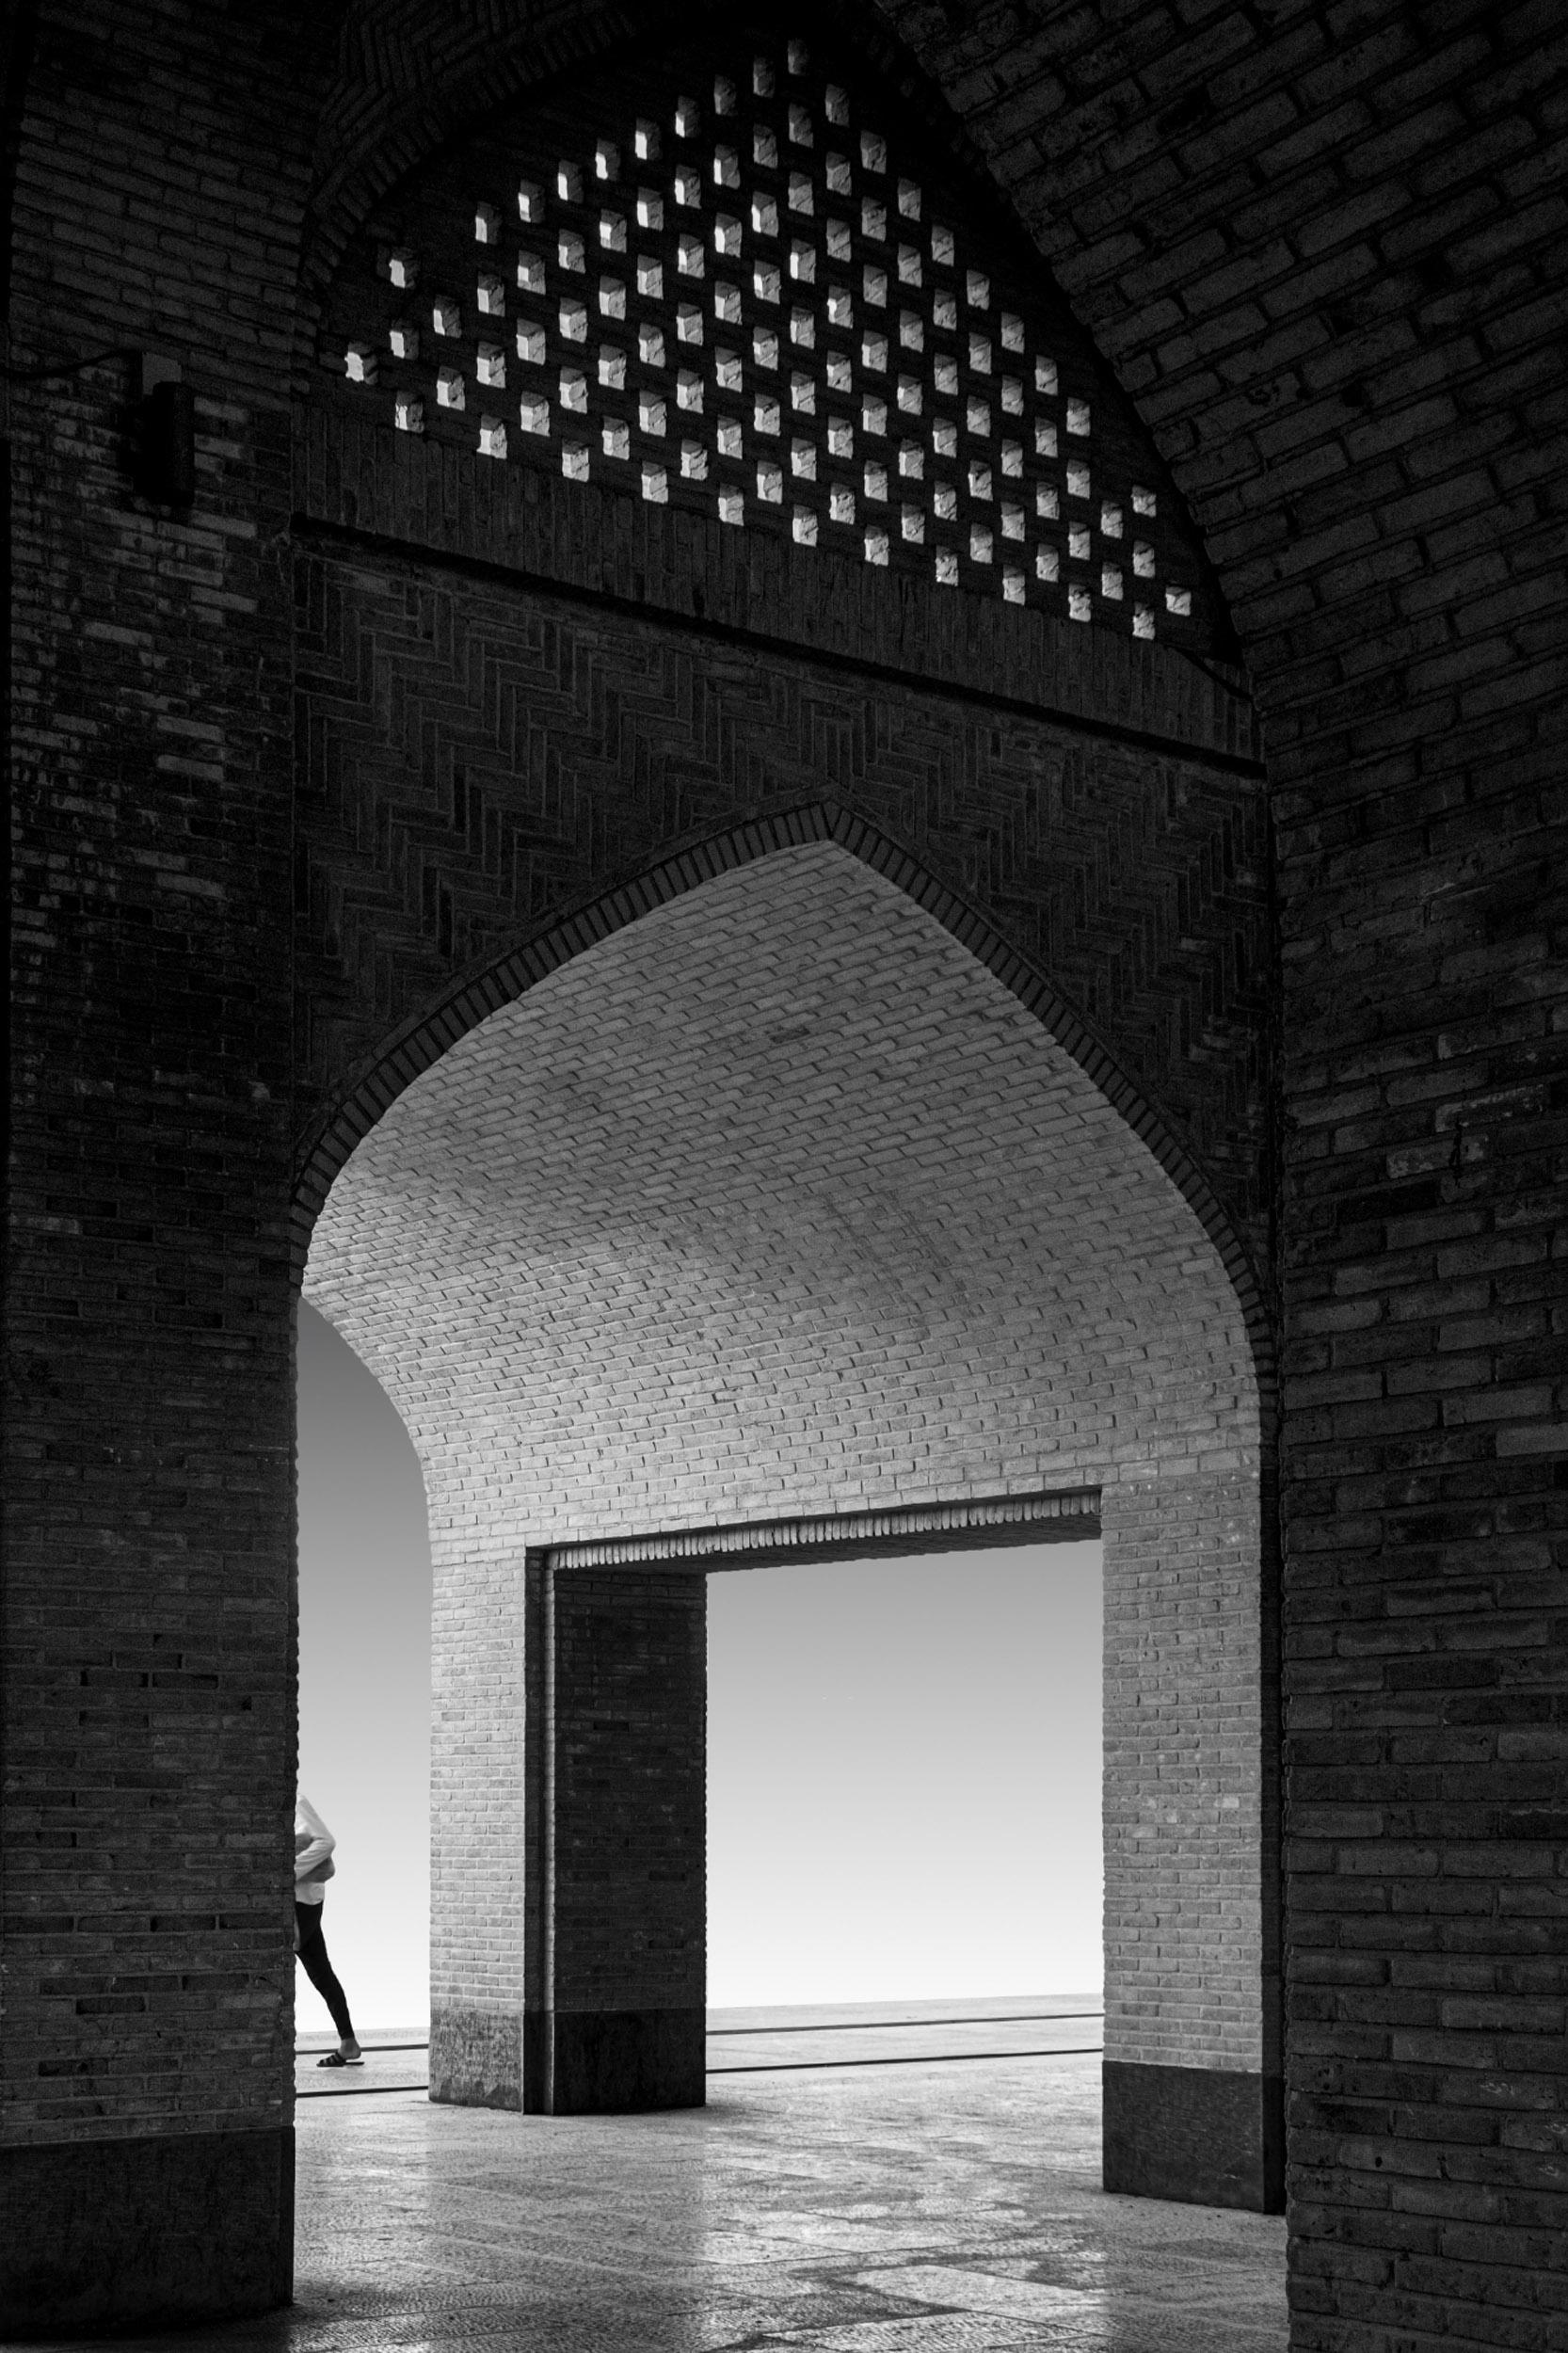 Categorie: Fine Art, Architecture & Interior - Photographer: MINA SHIRI - Location: Iran